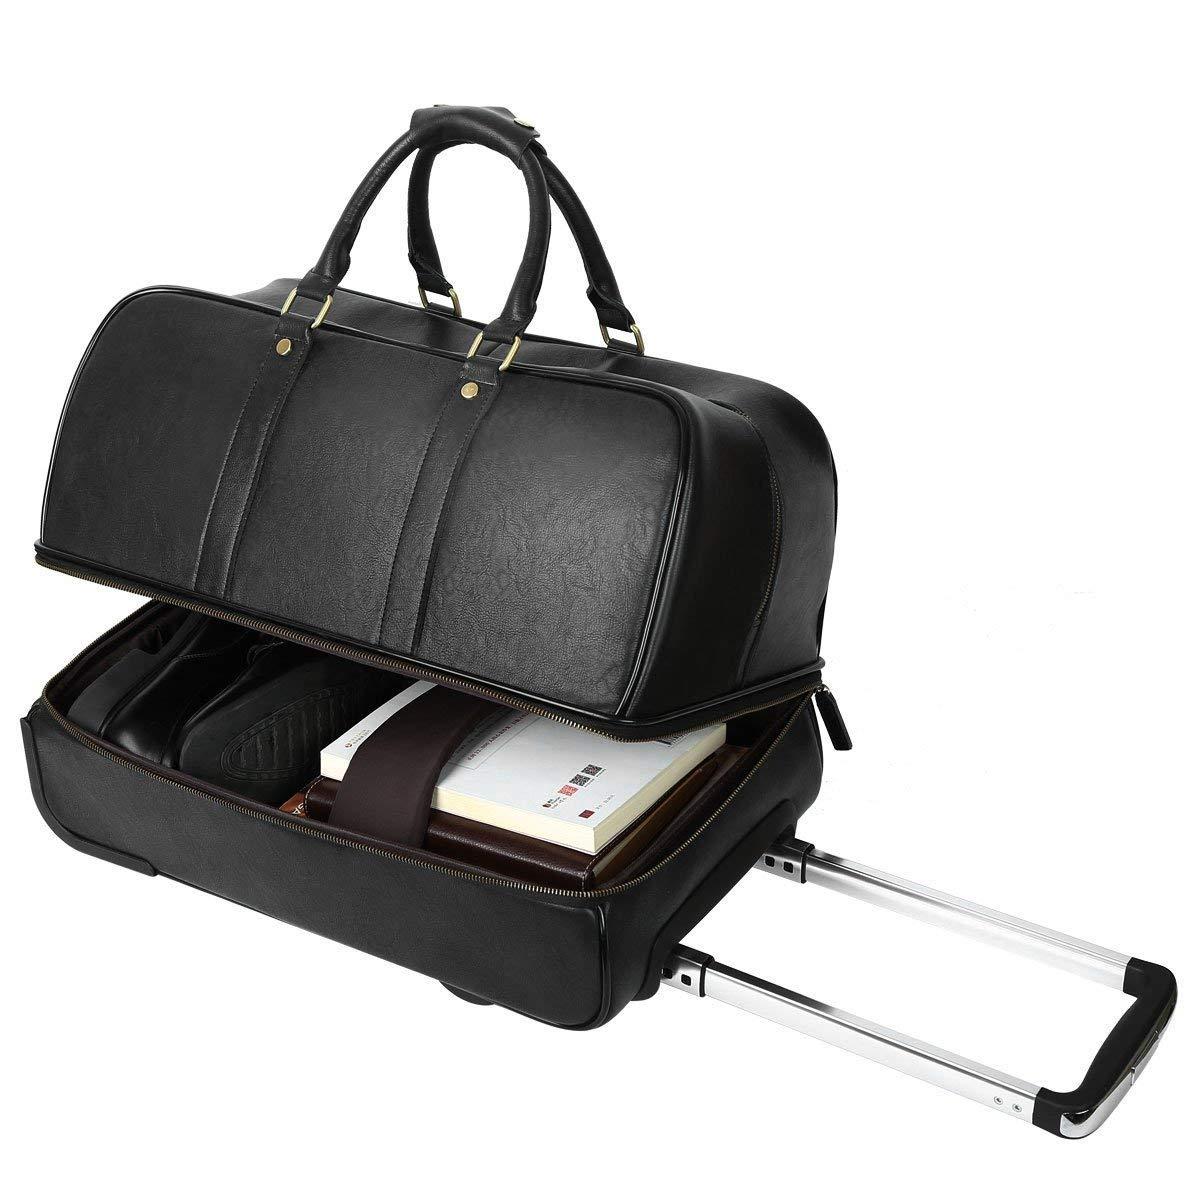 20a2451e1641 Leathario Men's Leather Luggage Wheeled Duffle, Leather Travel Bag (Black)